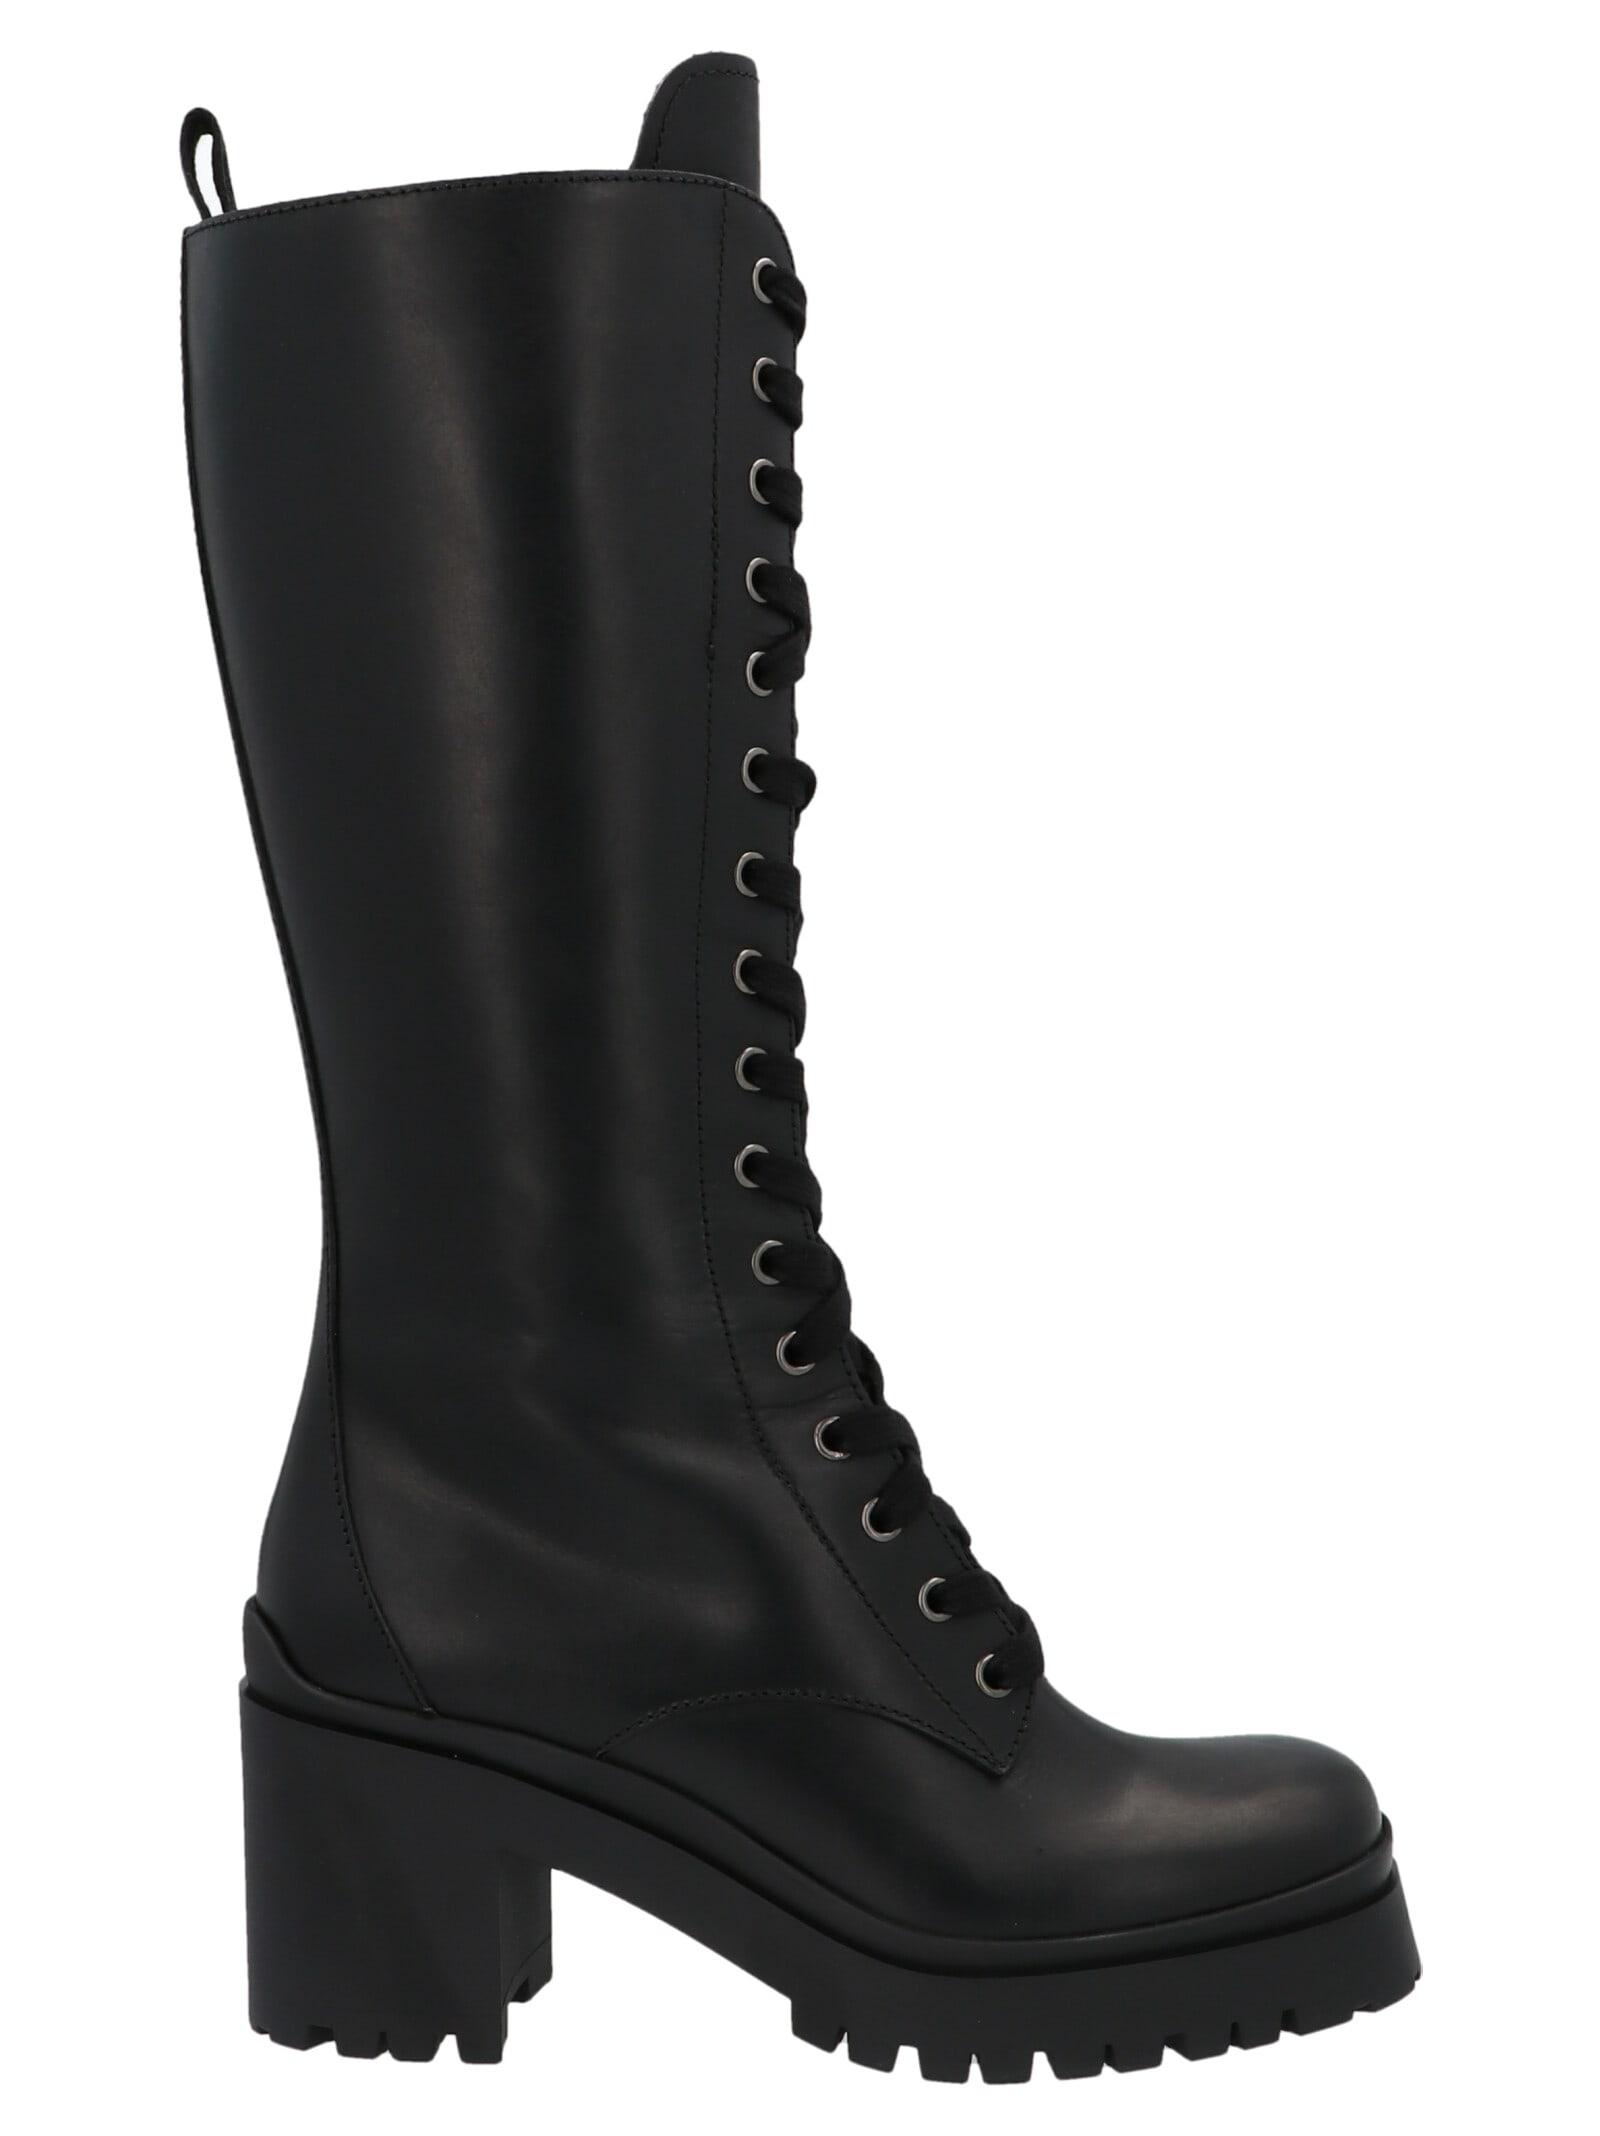 Buy Miu Miu Pull Up Leather Combat Boots online, shop Miu Miu shoes with free shipping